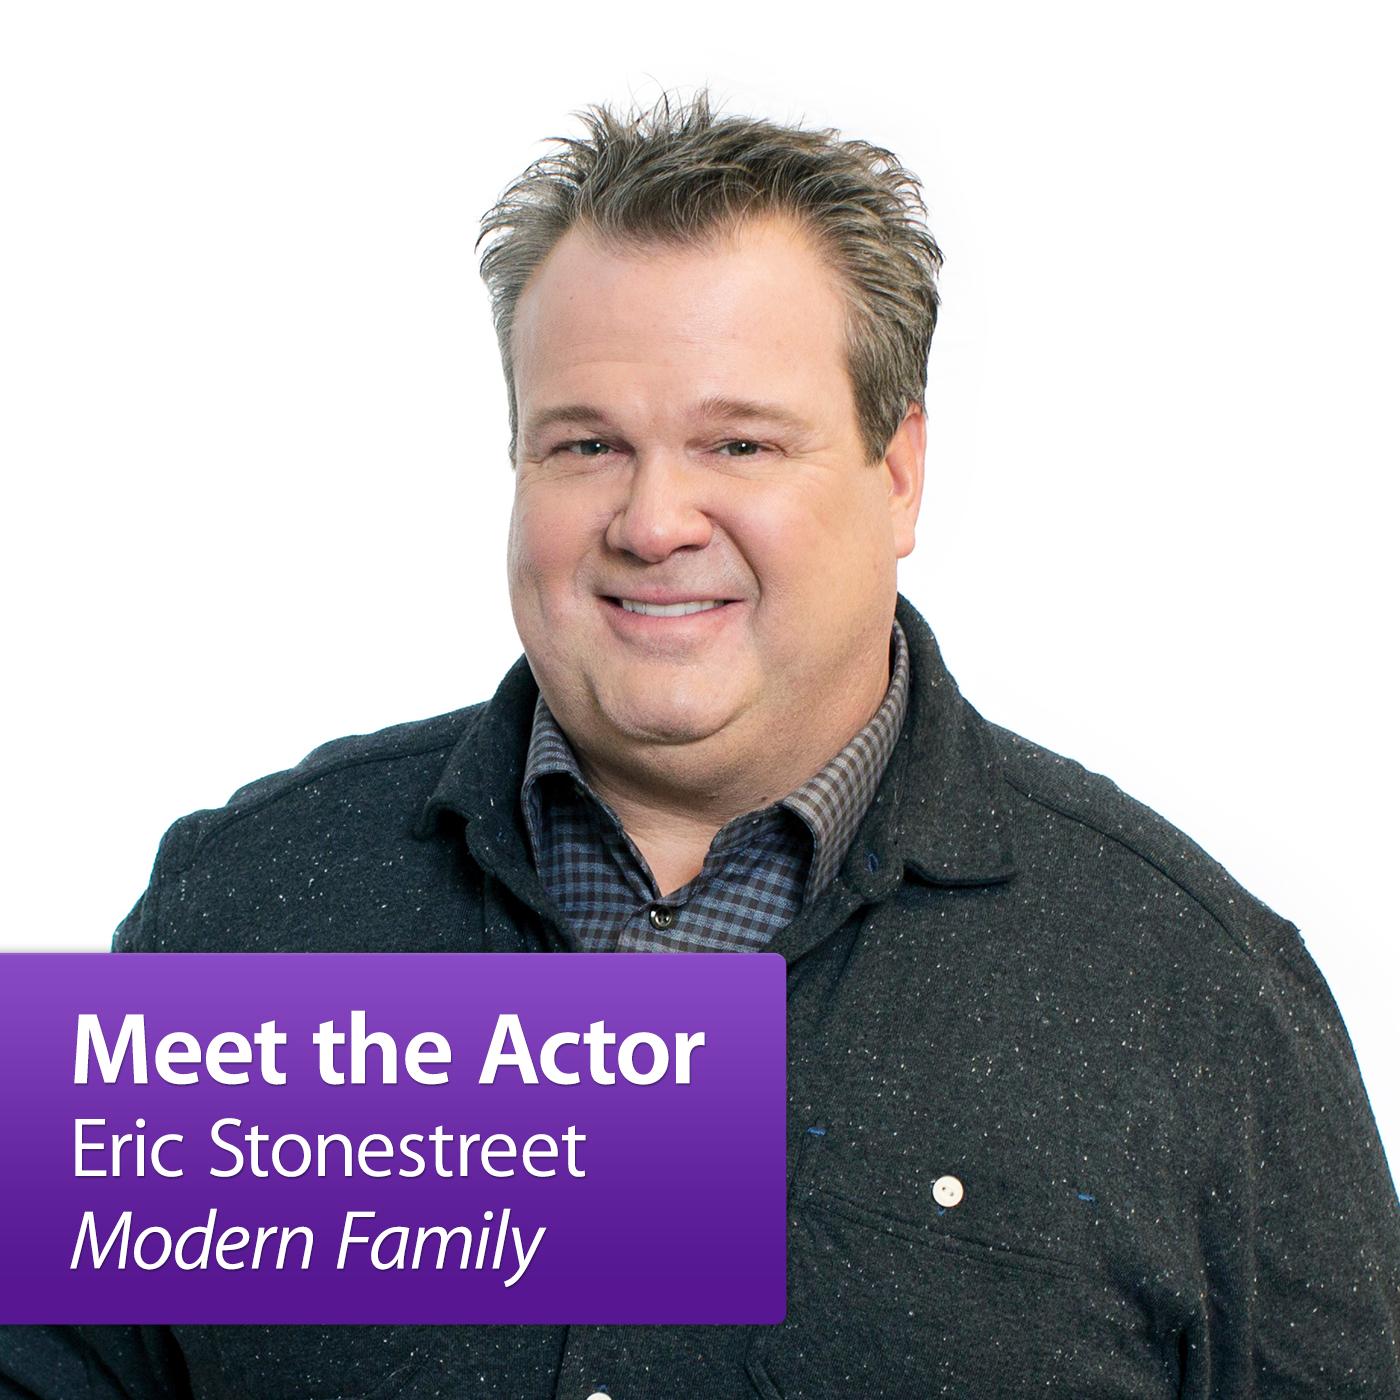 Eric Stonestreet: Meet the Actor